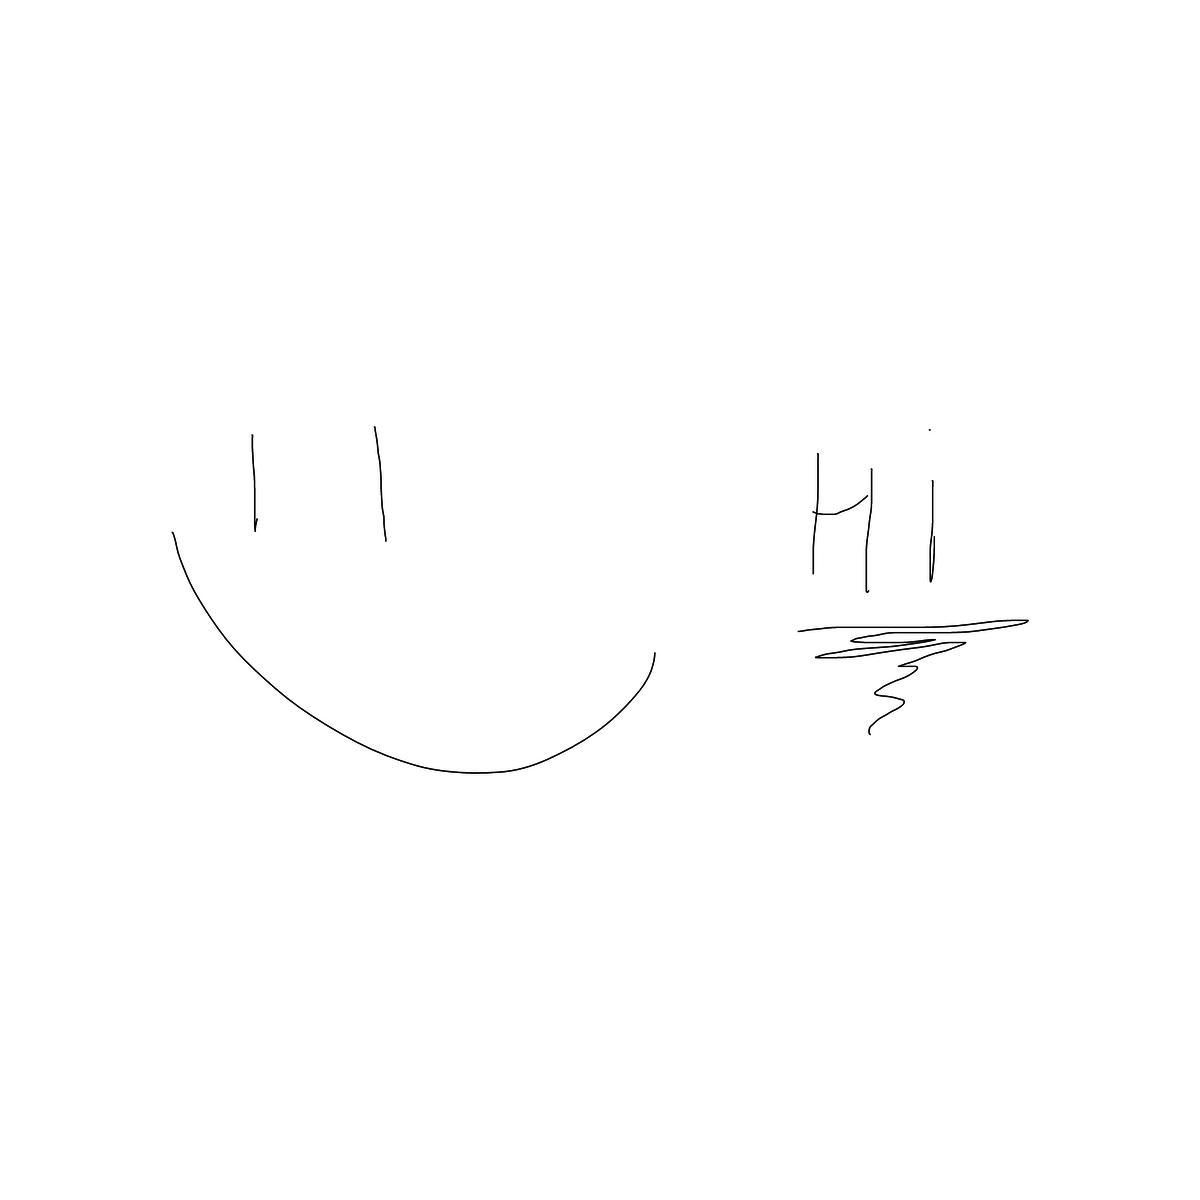 BAAAM drawing#7774 lat:26.3791904449462900lng: -98.8212356567382800